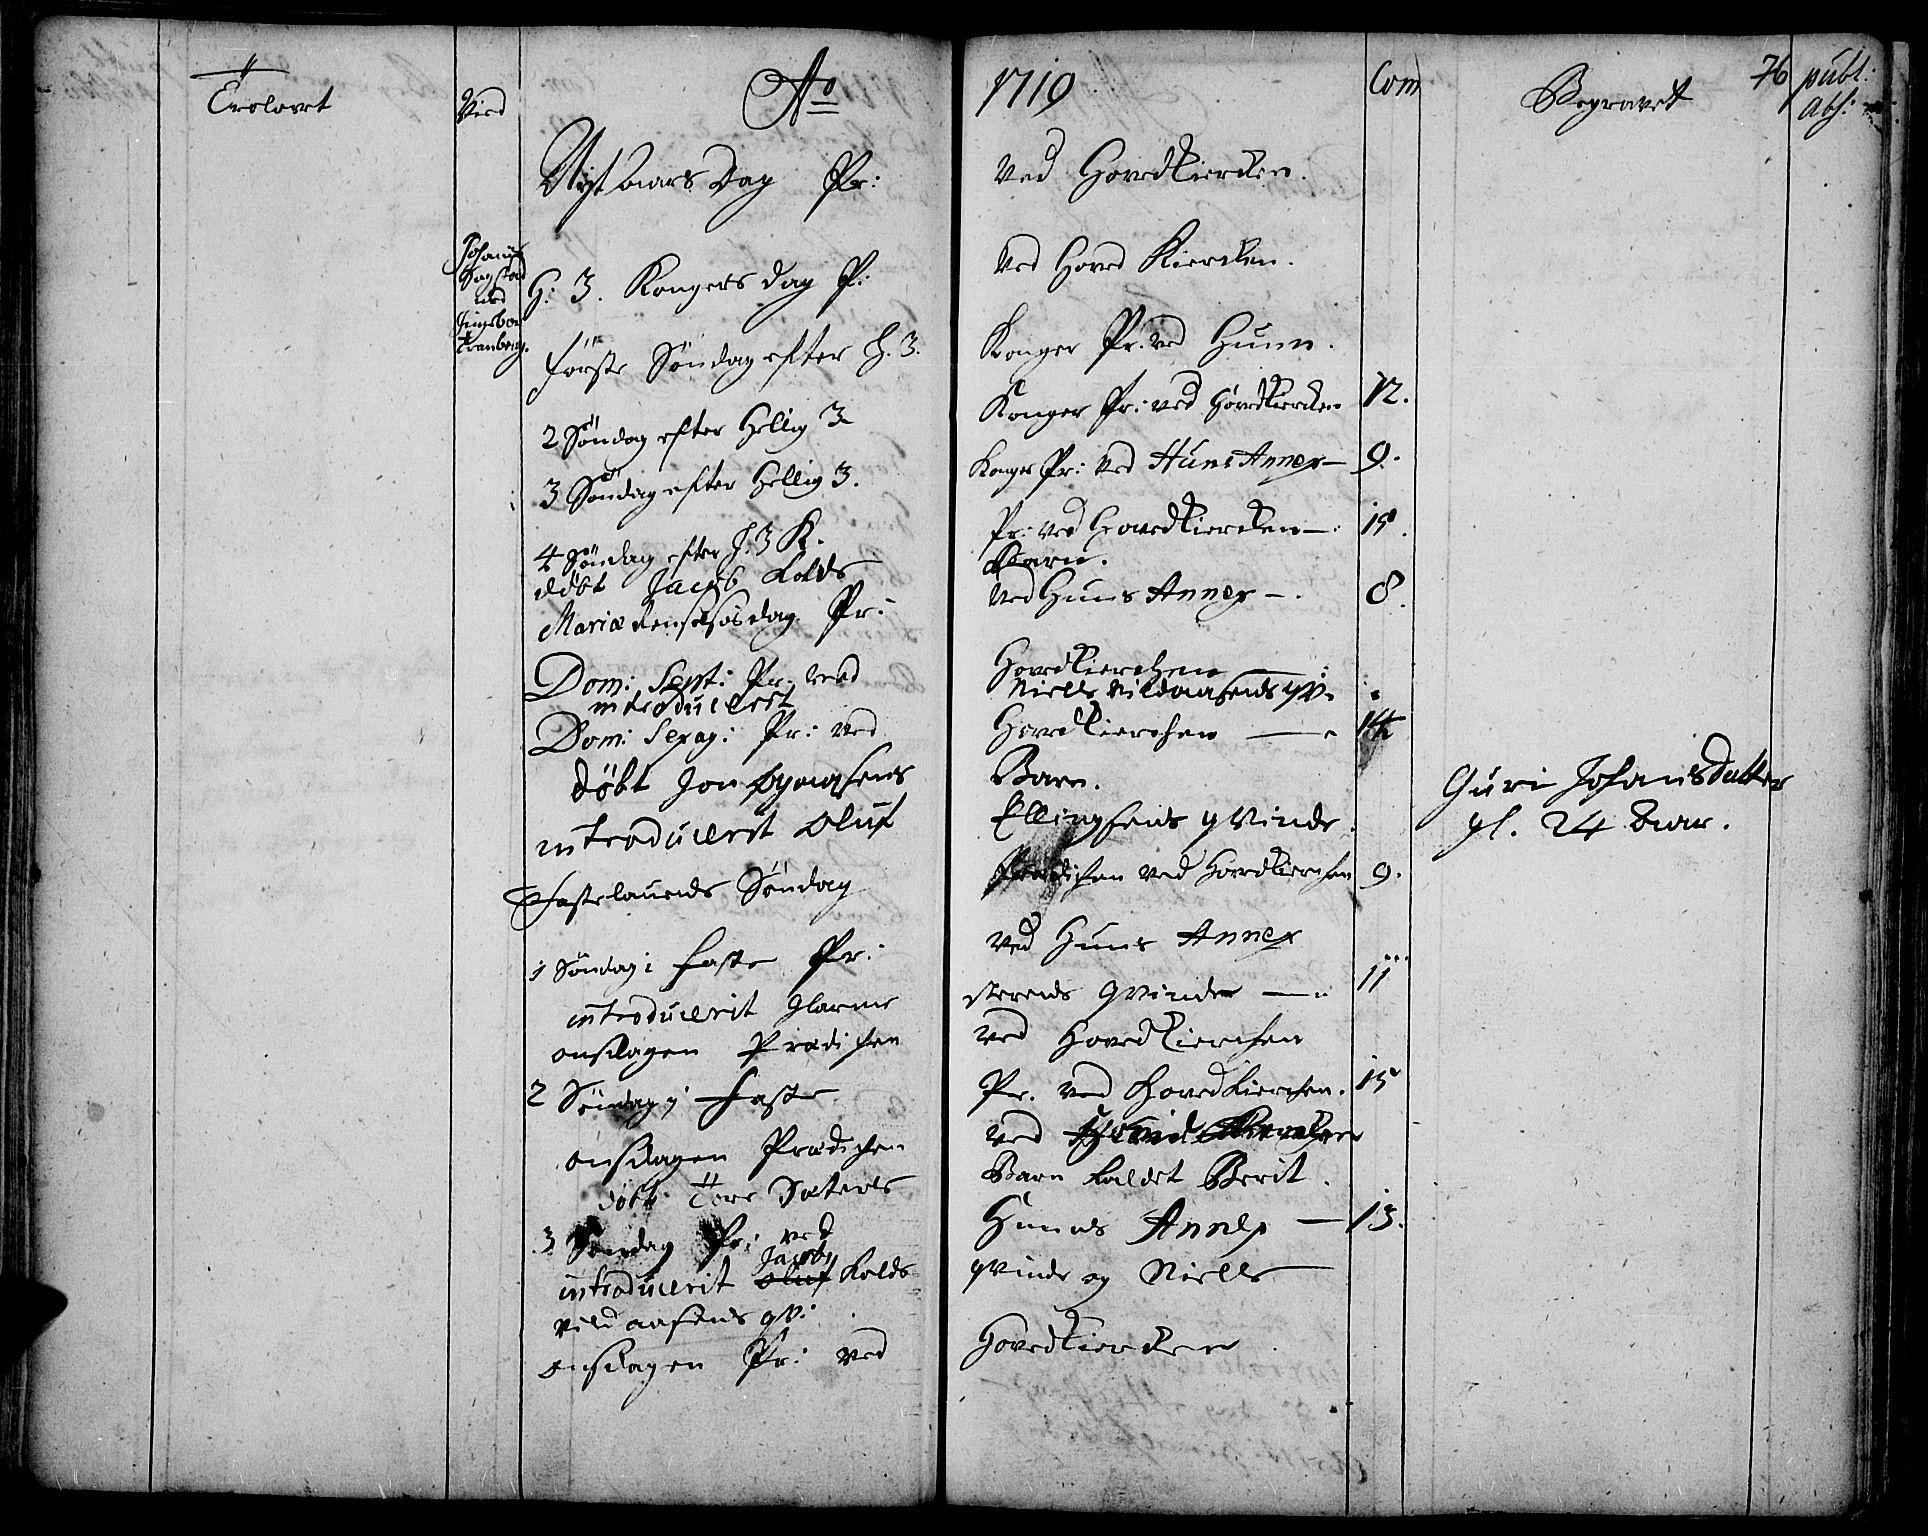 SAH, Vardal prestekontor, H/Ha/Haa/L0001: Ministerialbok nr. 1, 1706-1748, s. 76